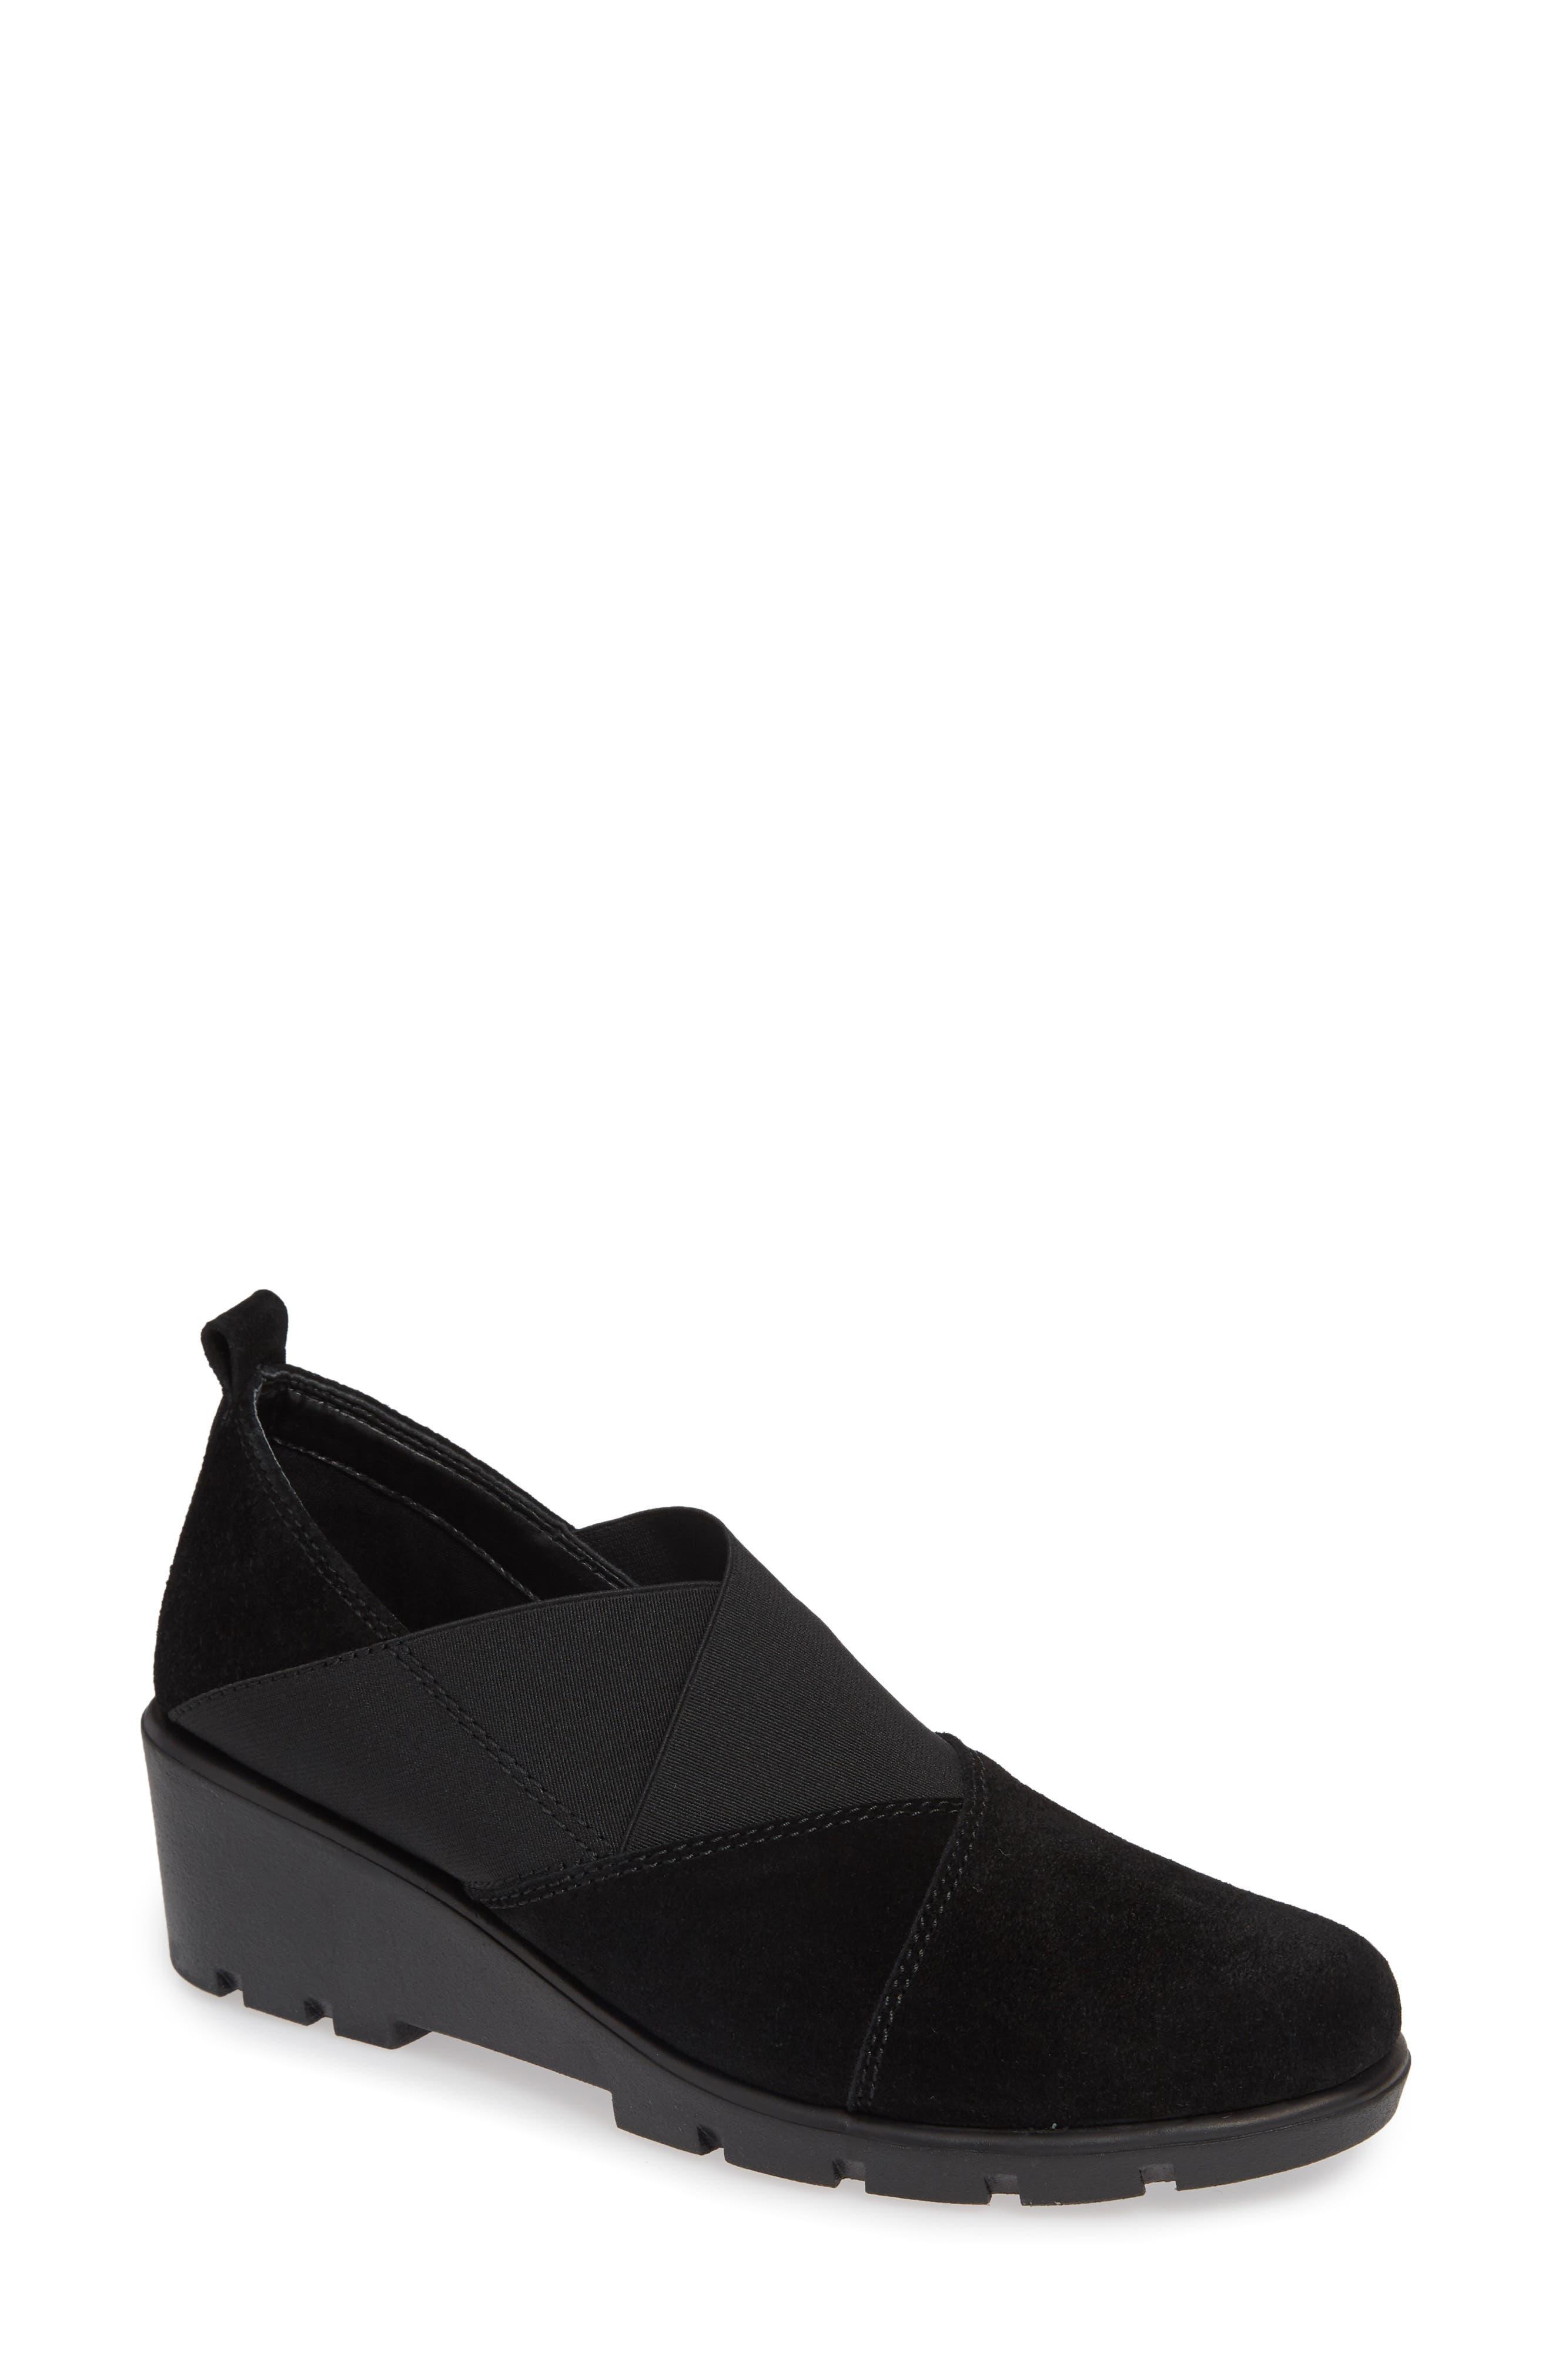 The Flexx Crosstown Slip-On Shoe- Black